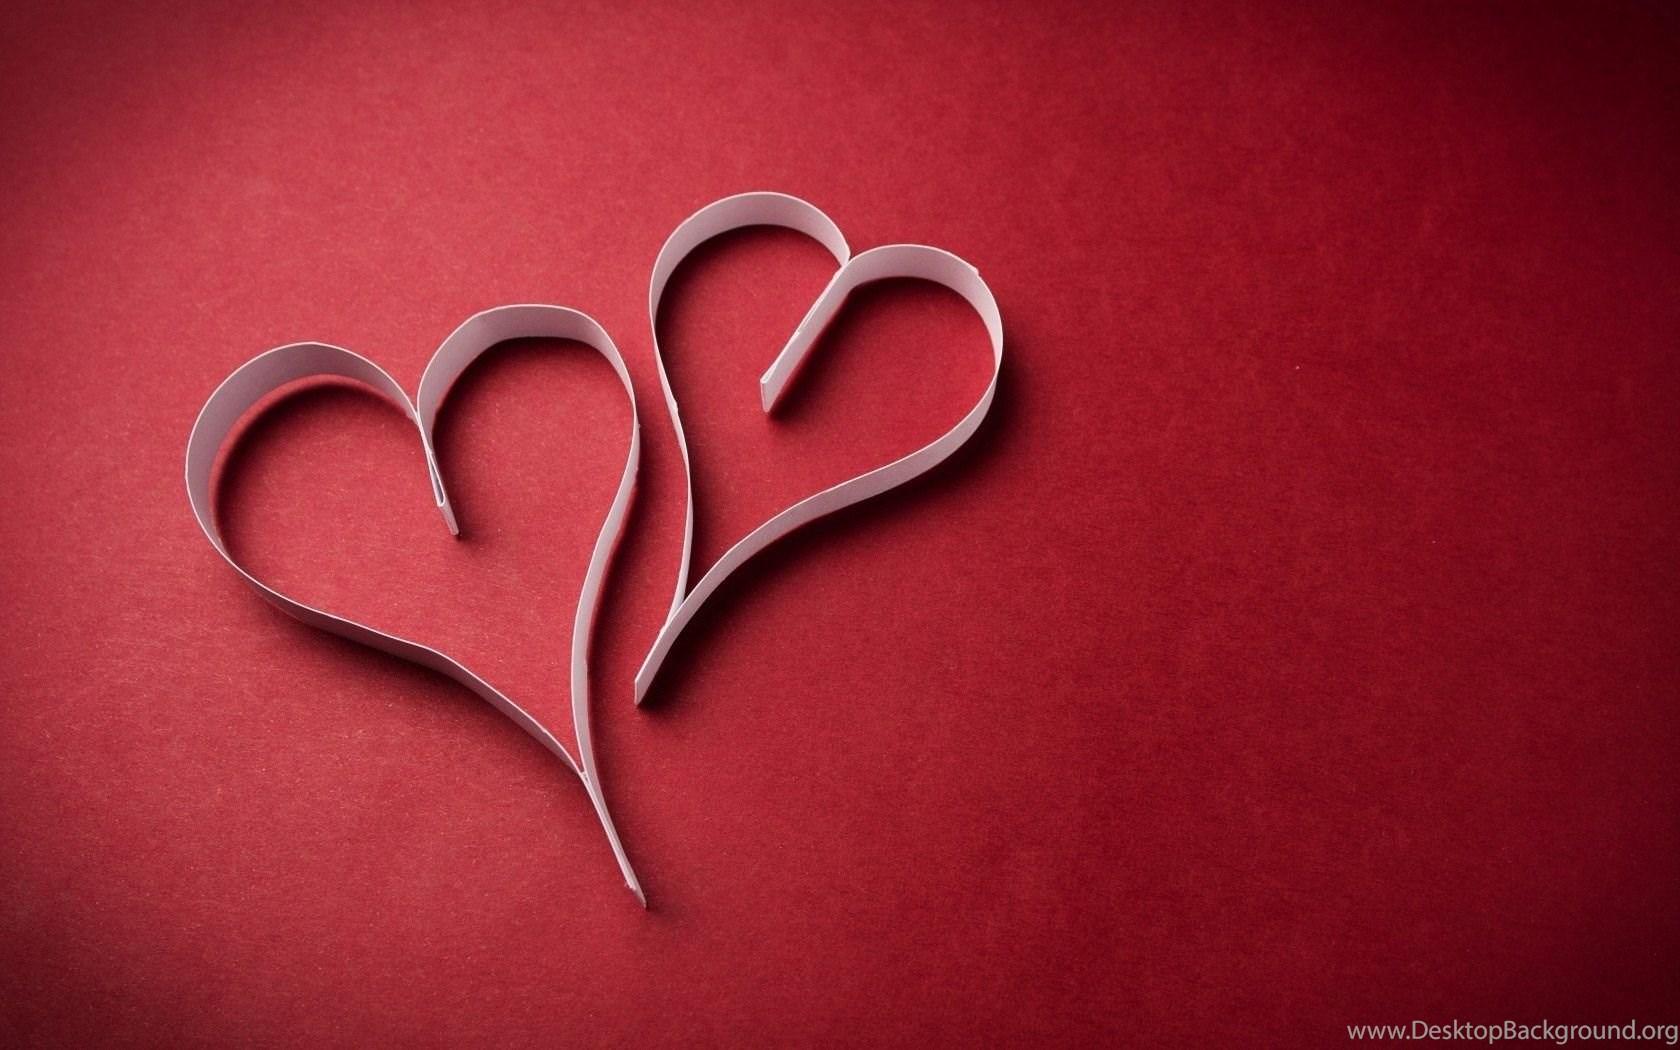 love hearts hd images 6 free hd wallpapers hdlovewall desktop